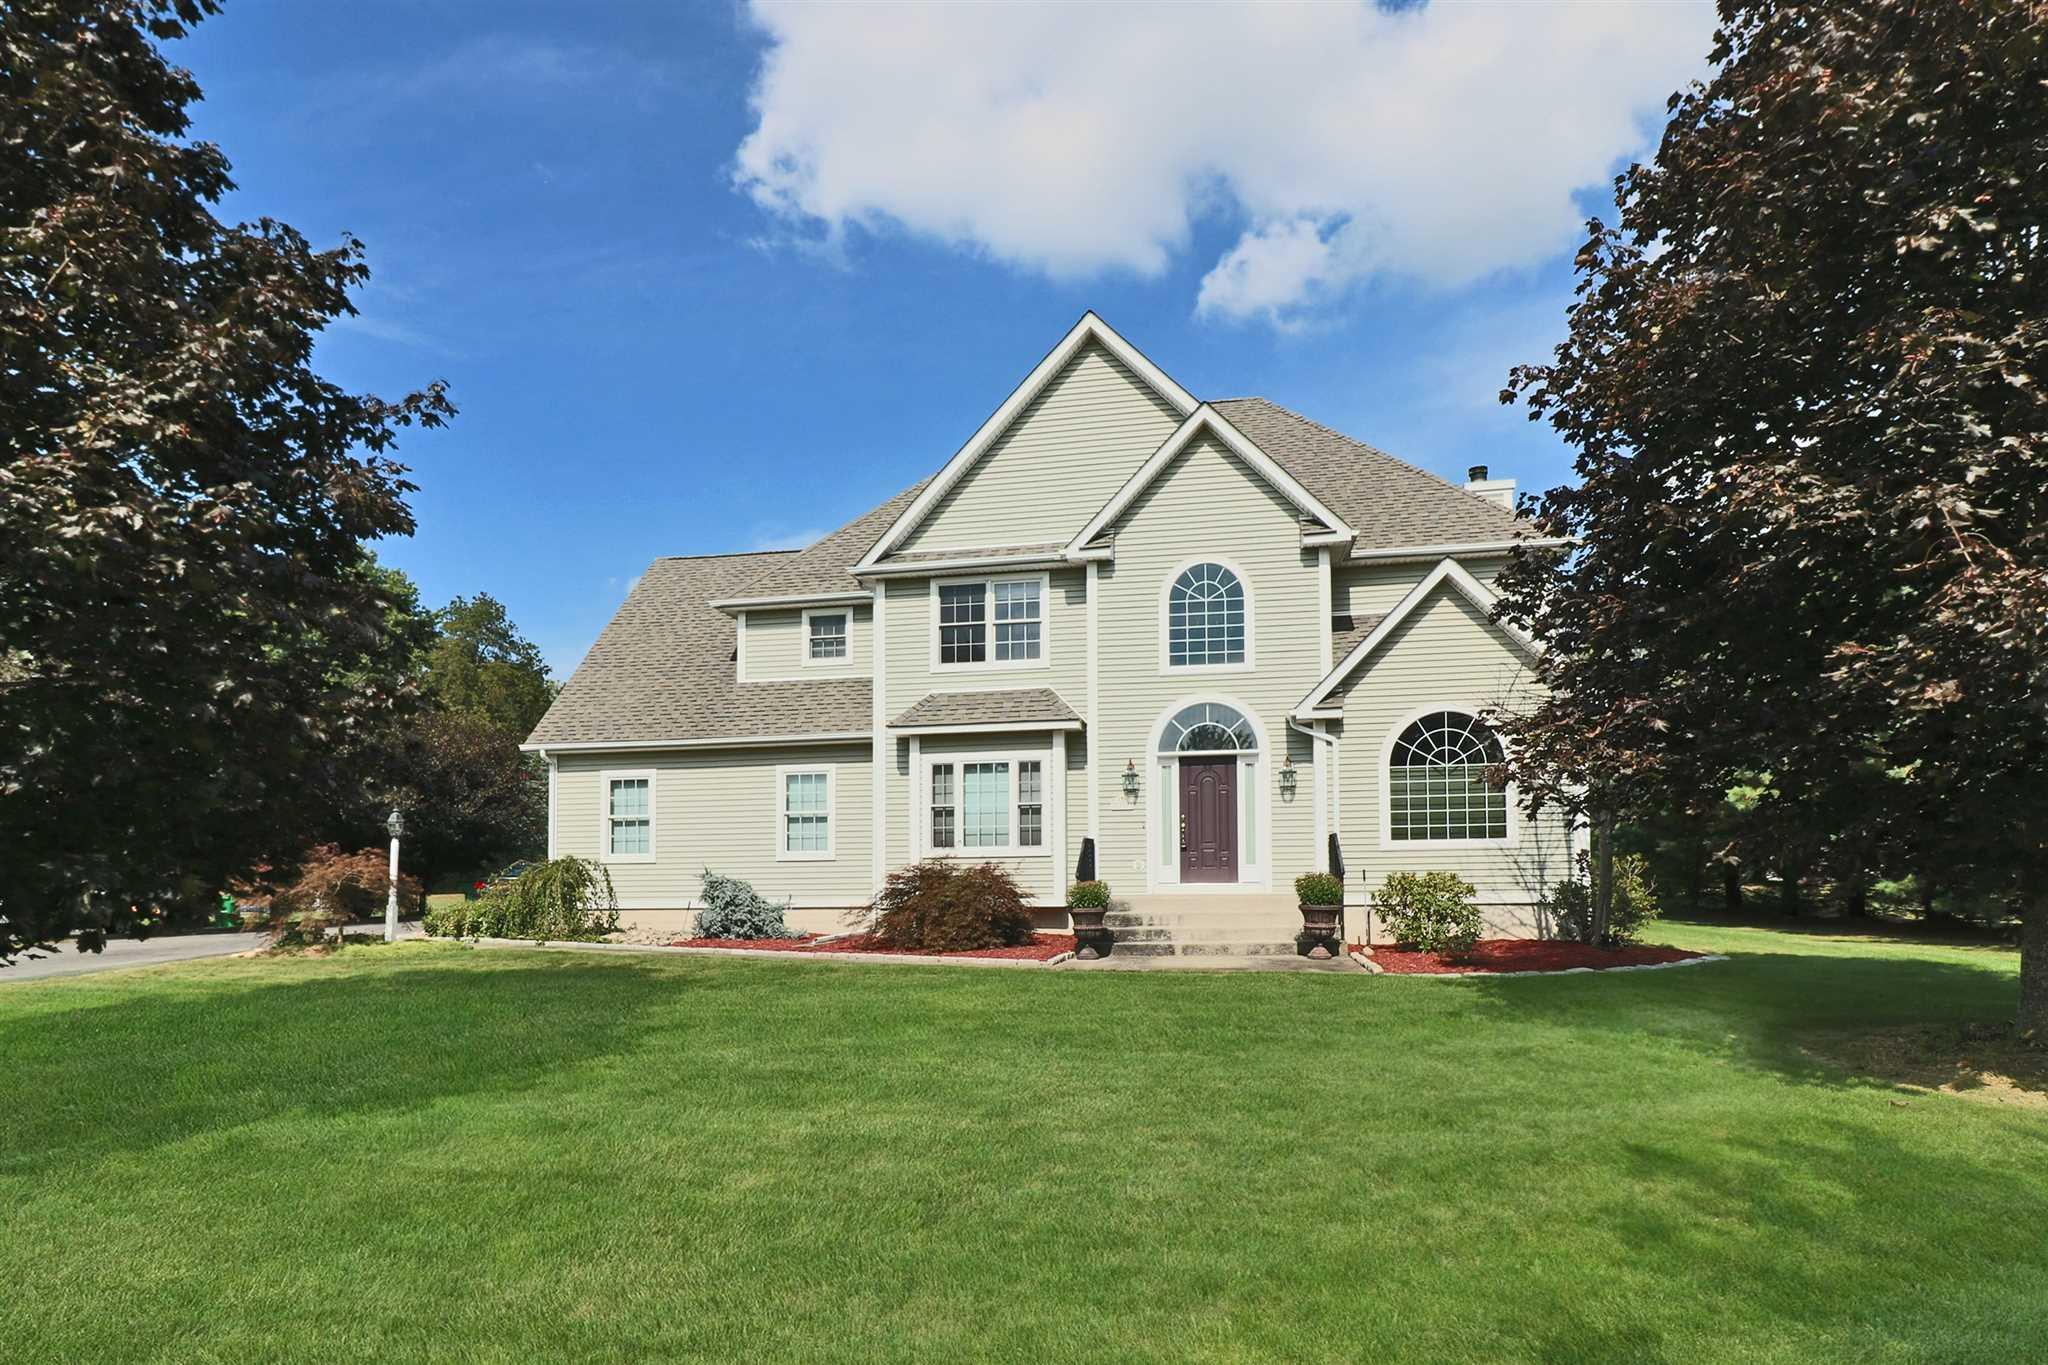 Single Family Home for Sale at 55 GUINNESS 55 GUINNESS East Fishkill, New York 12533 United States